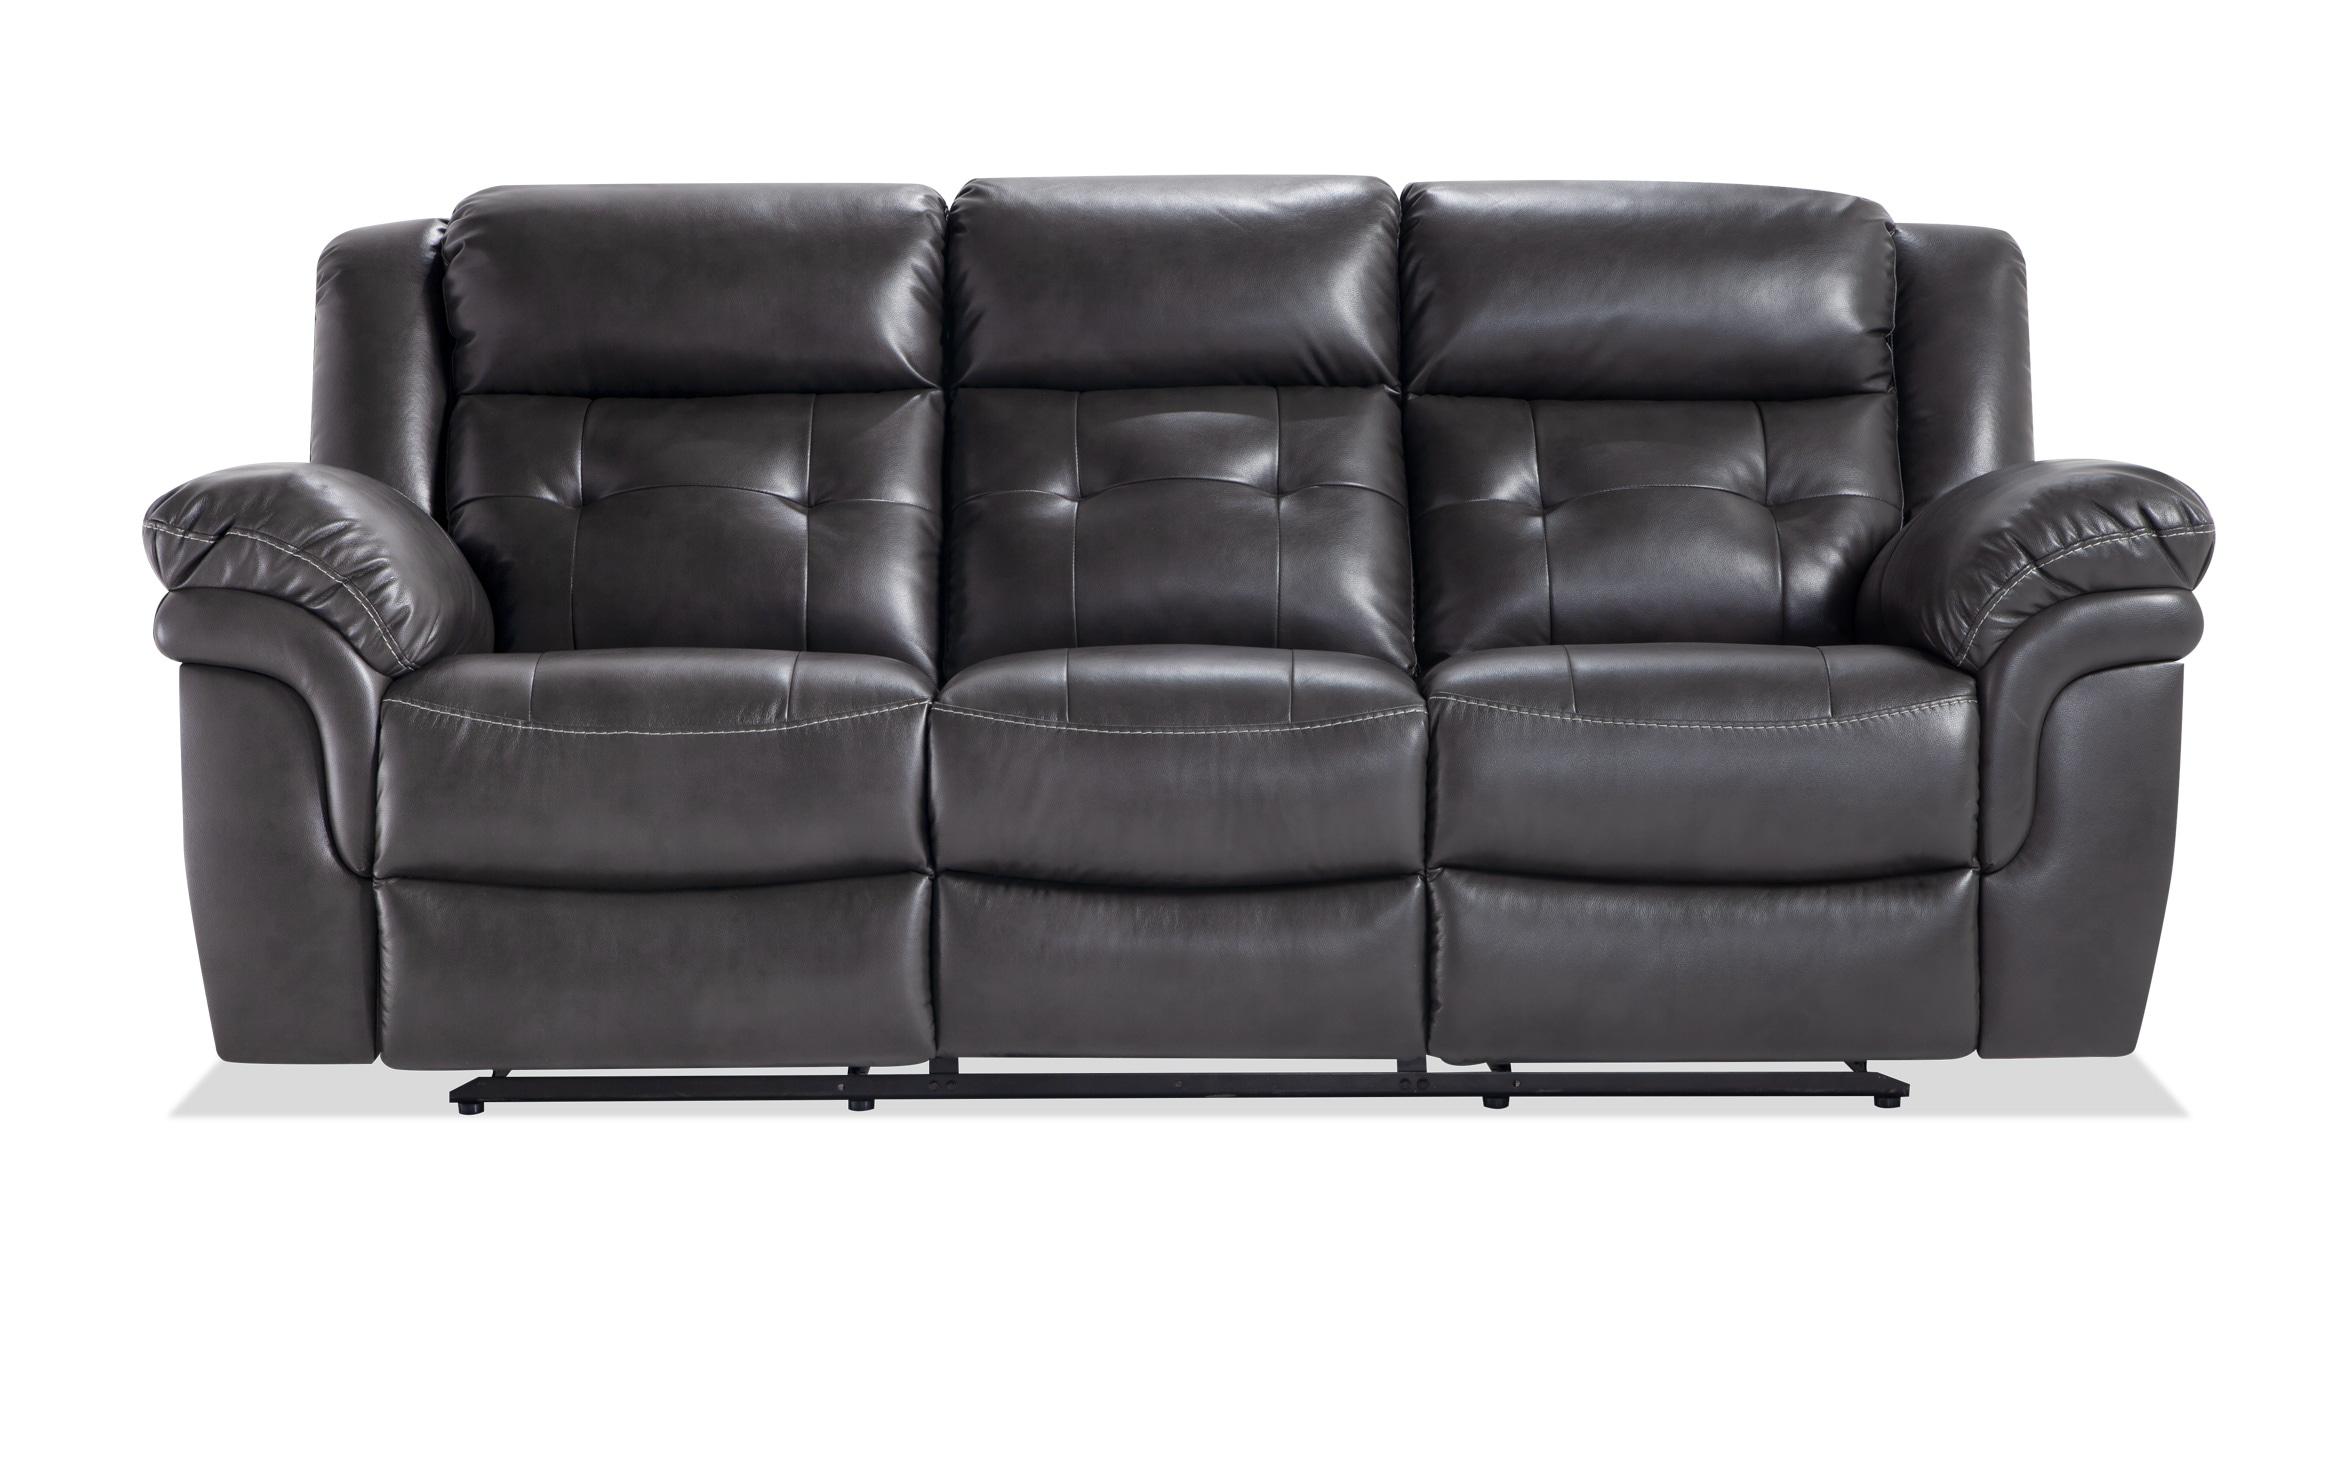 Navigator Gray Manual Reclining Sofa